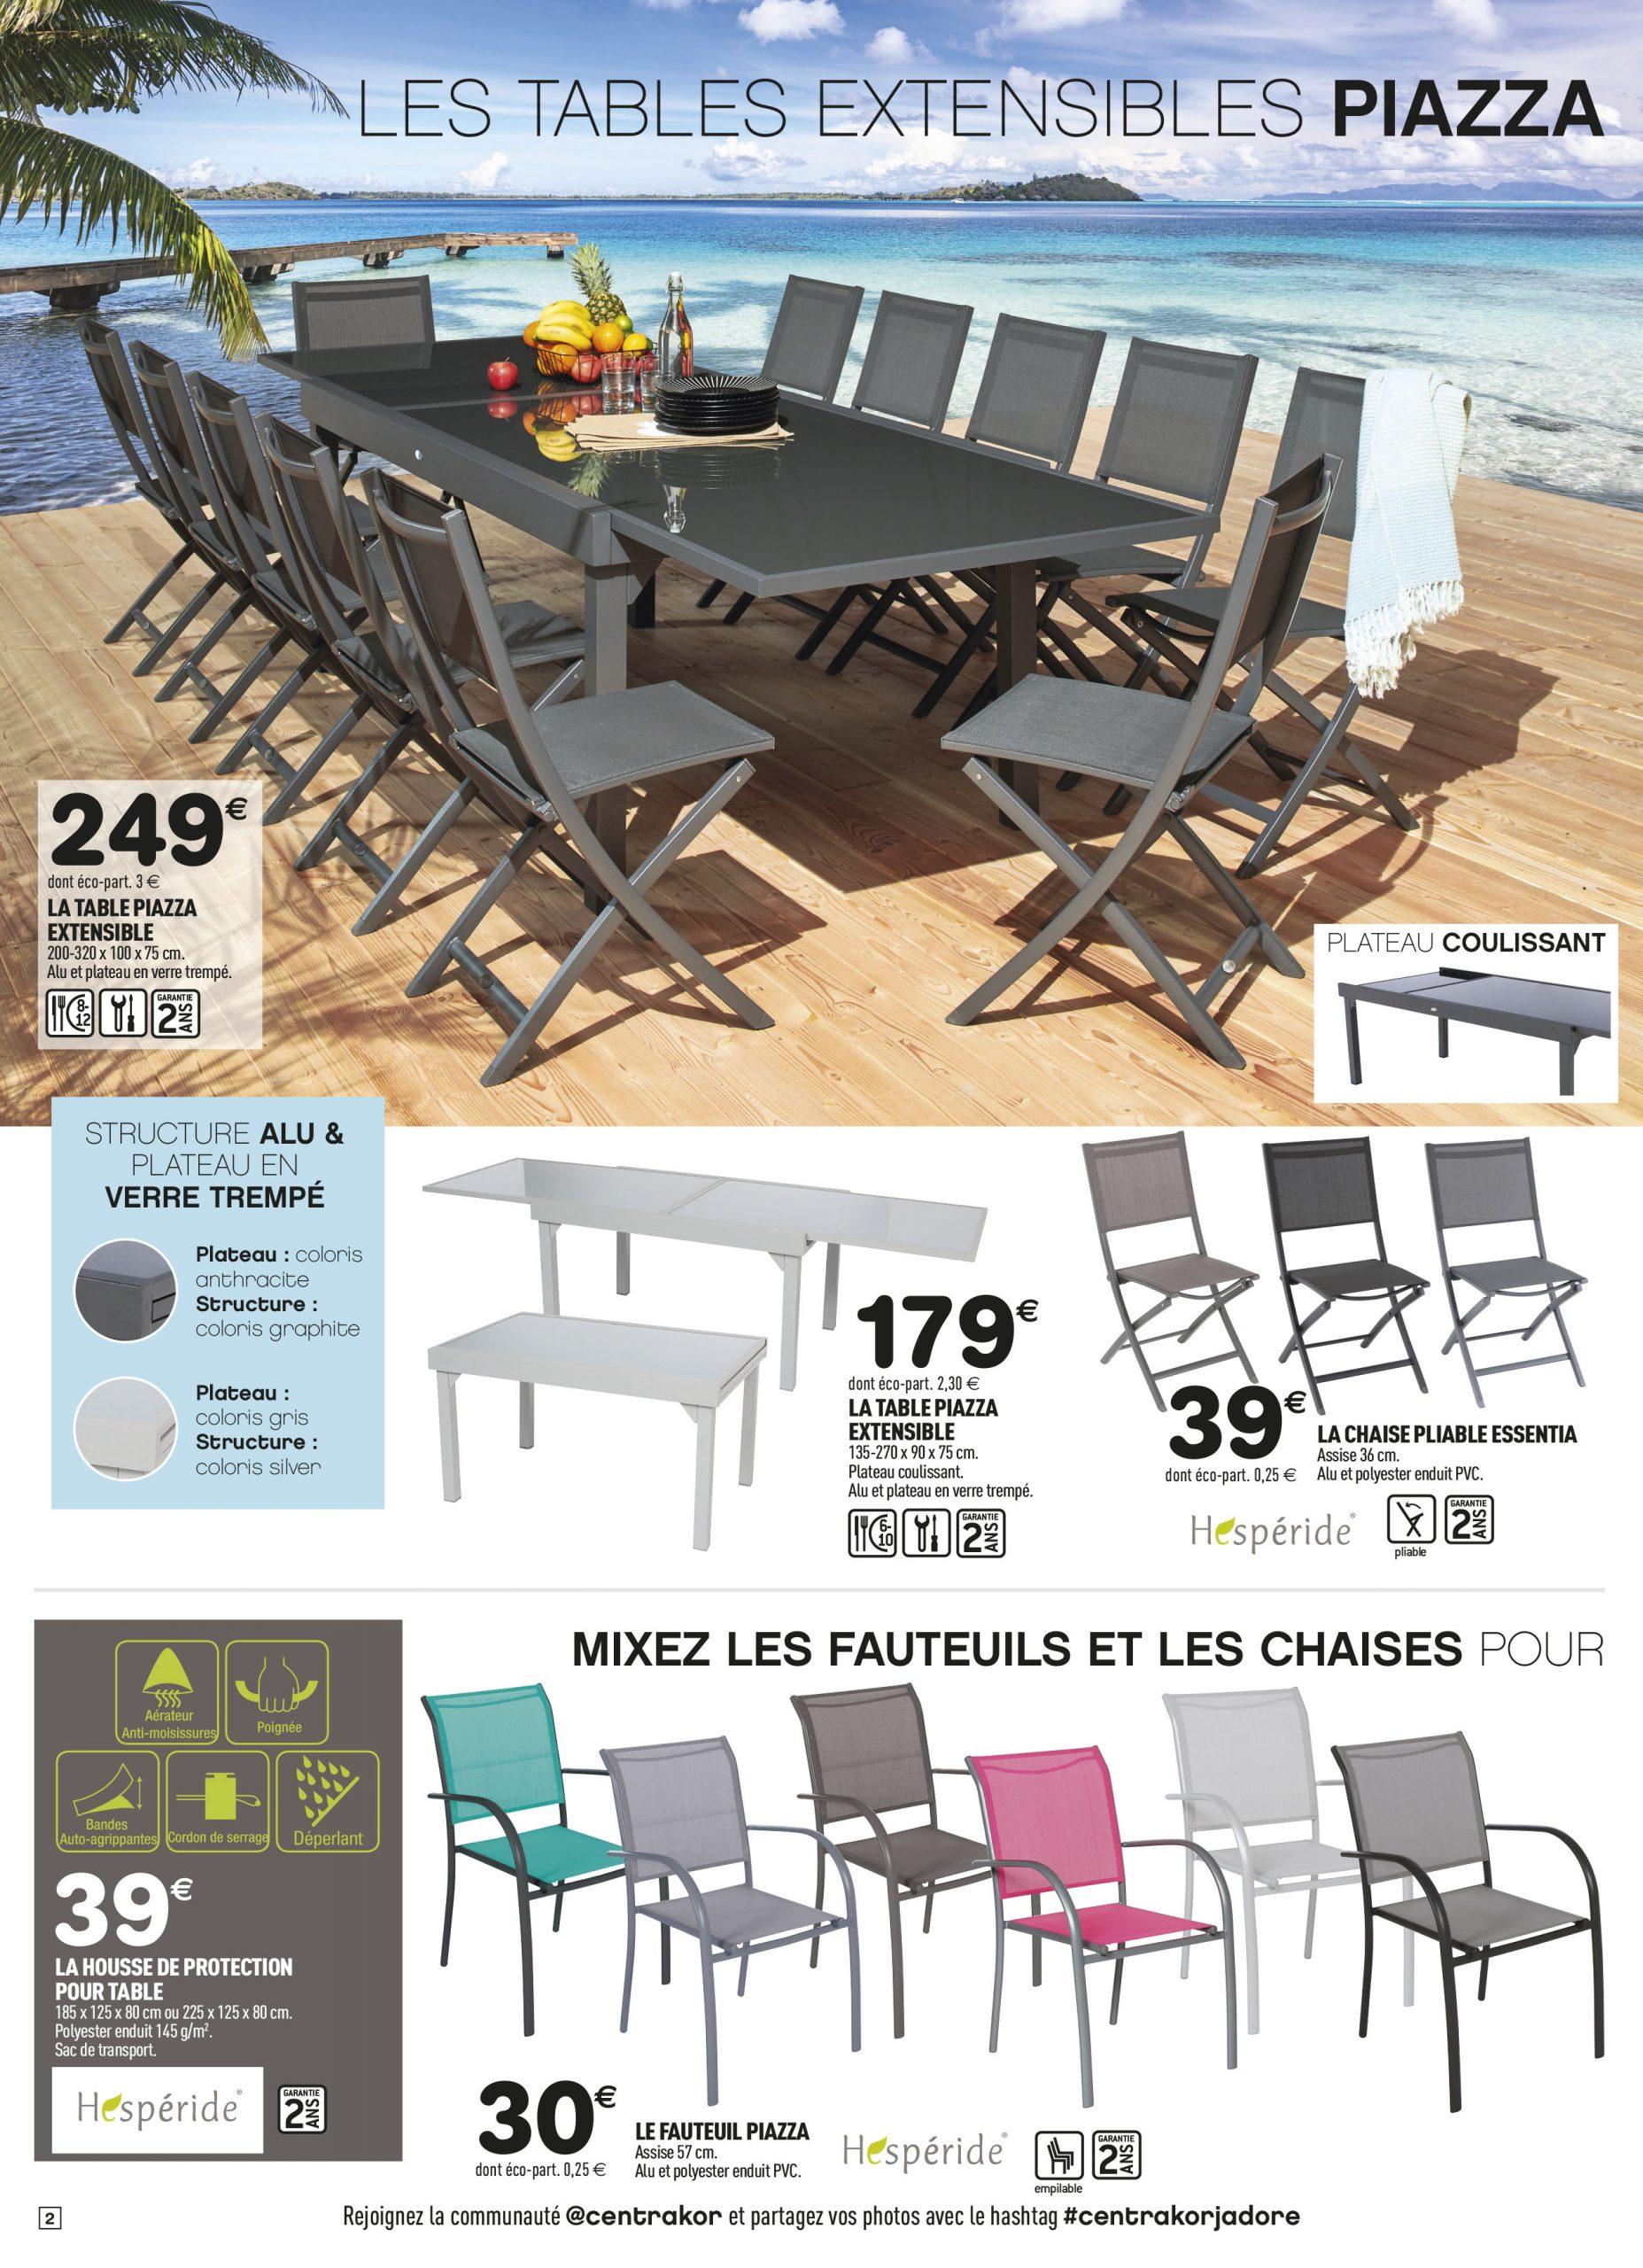 Zoom Sur Nos Tables De Jardin Extensibles. | Centrakor ... encequiconcerne Fauteuil Hesperide Piazza Centrakor